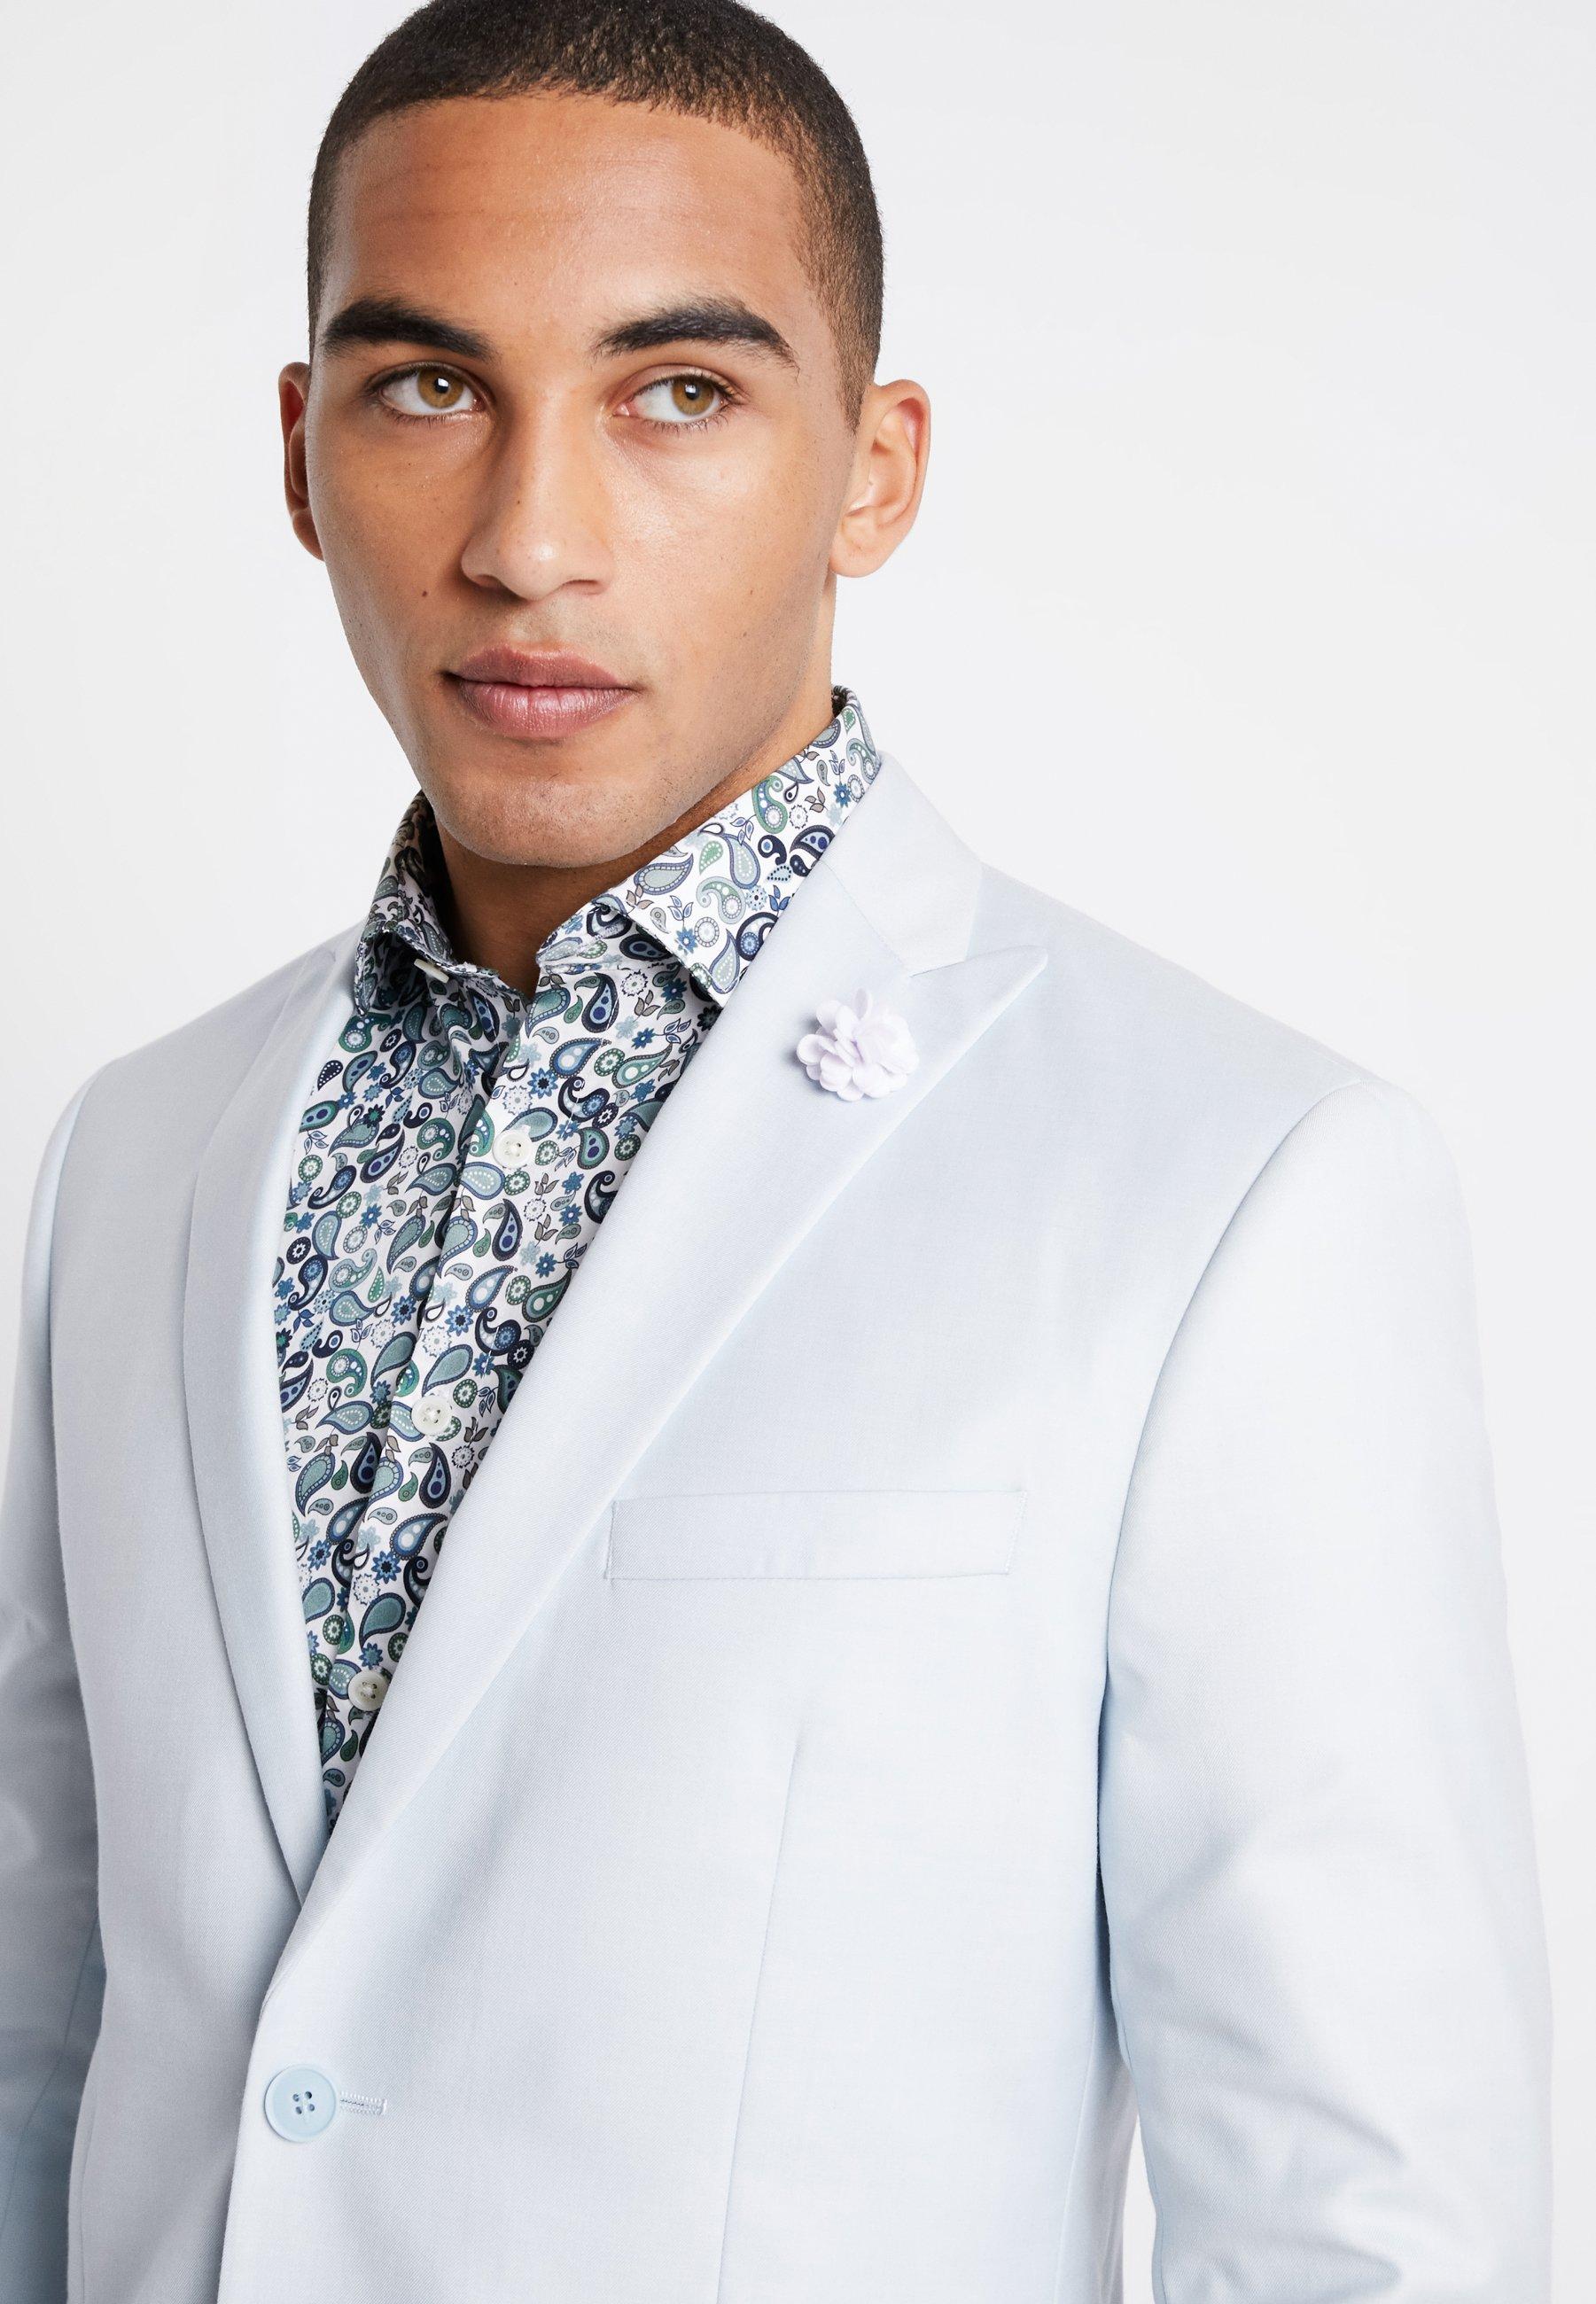 PaleCostume Light Wedding Blue Isaac Dewhirst Suit m6gyv7YfbI